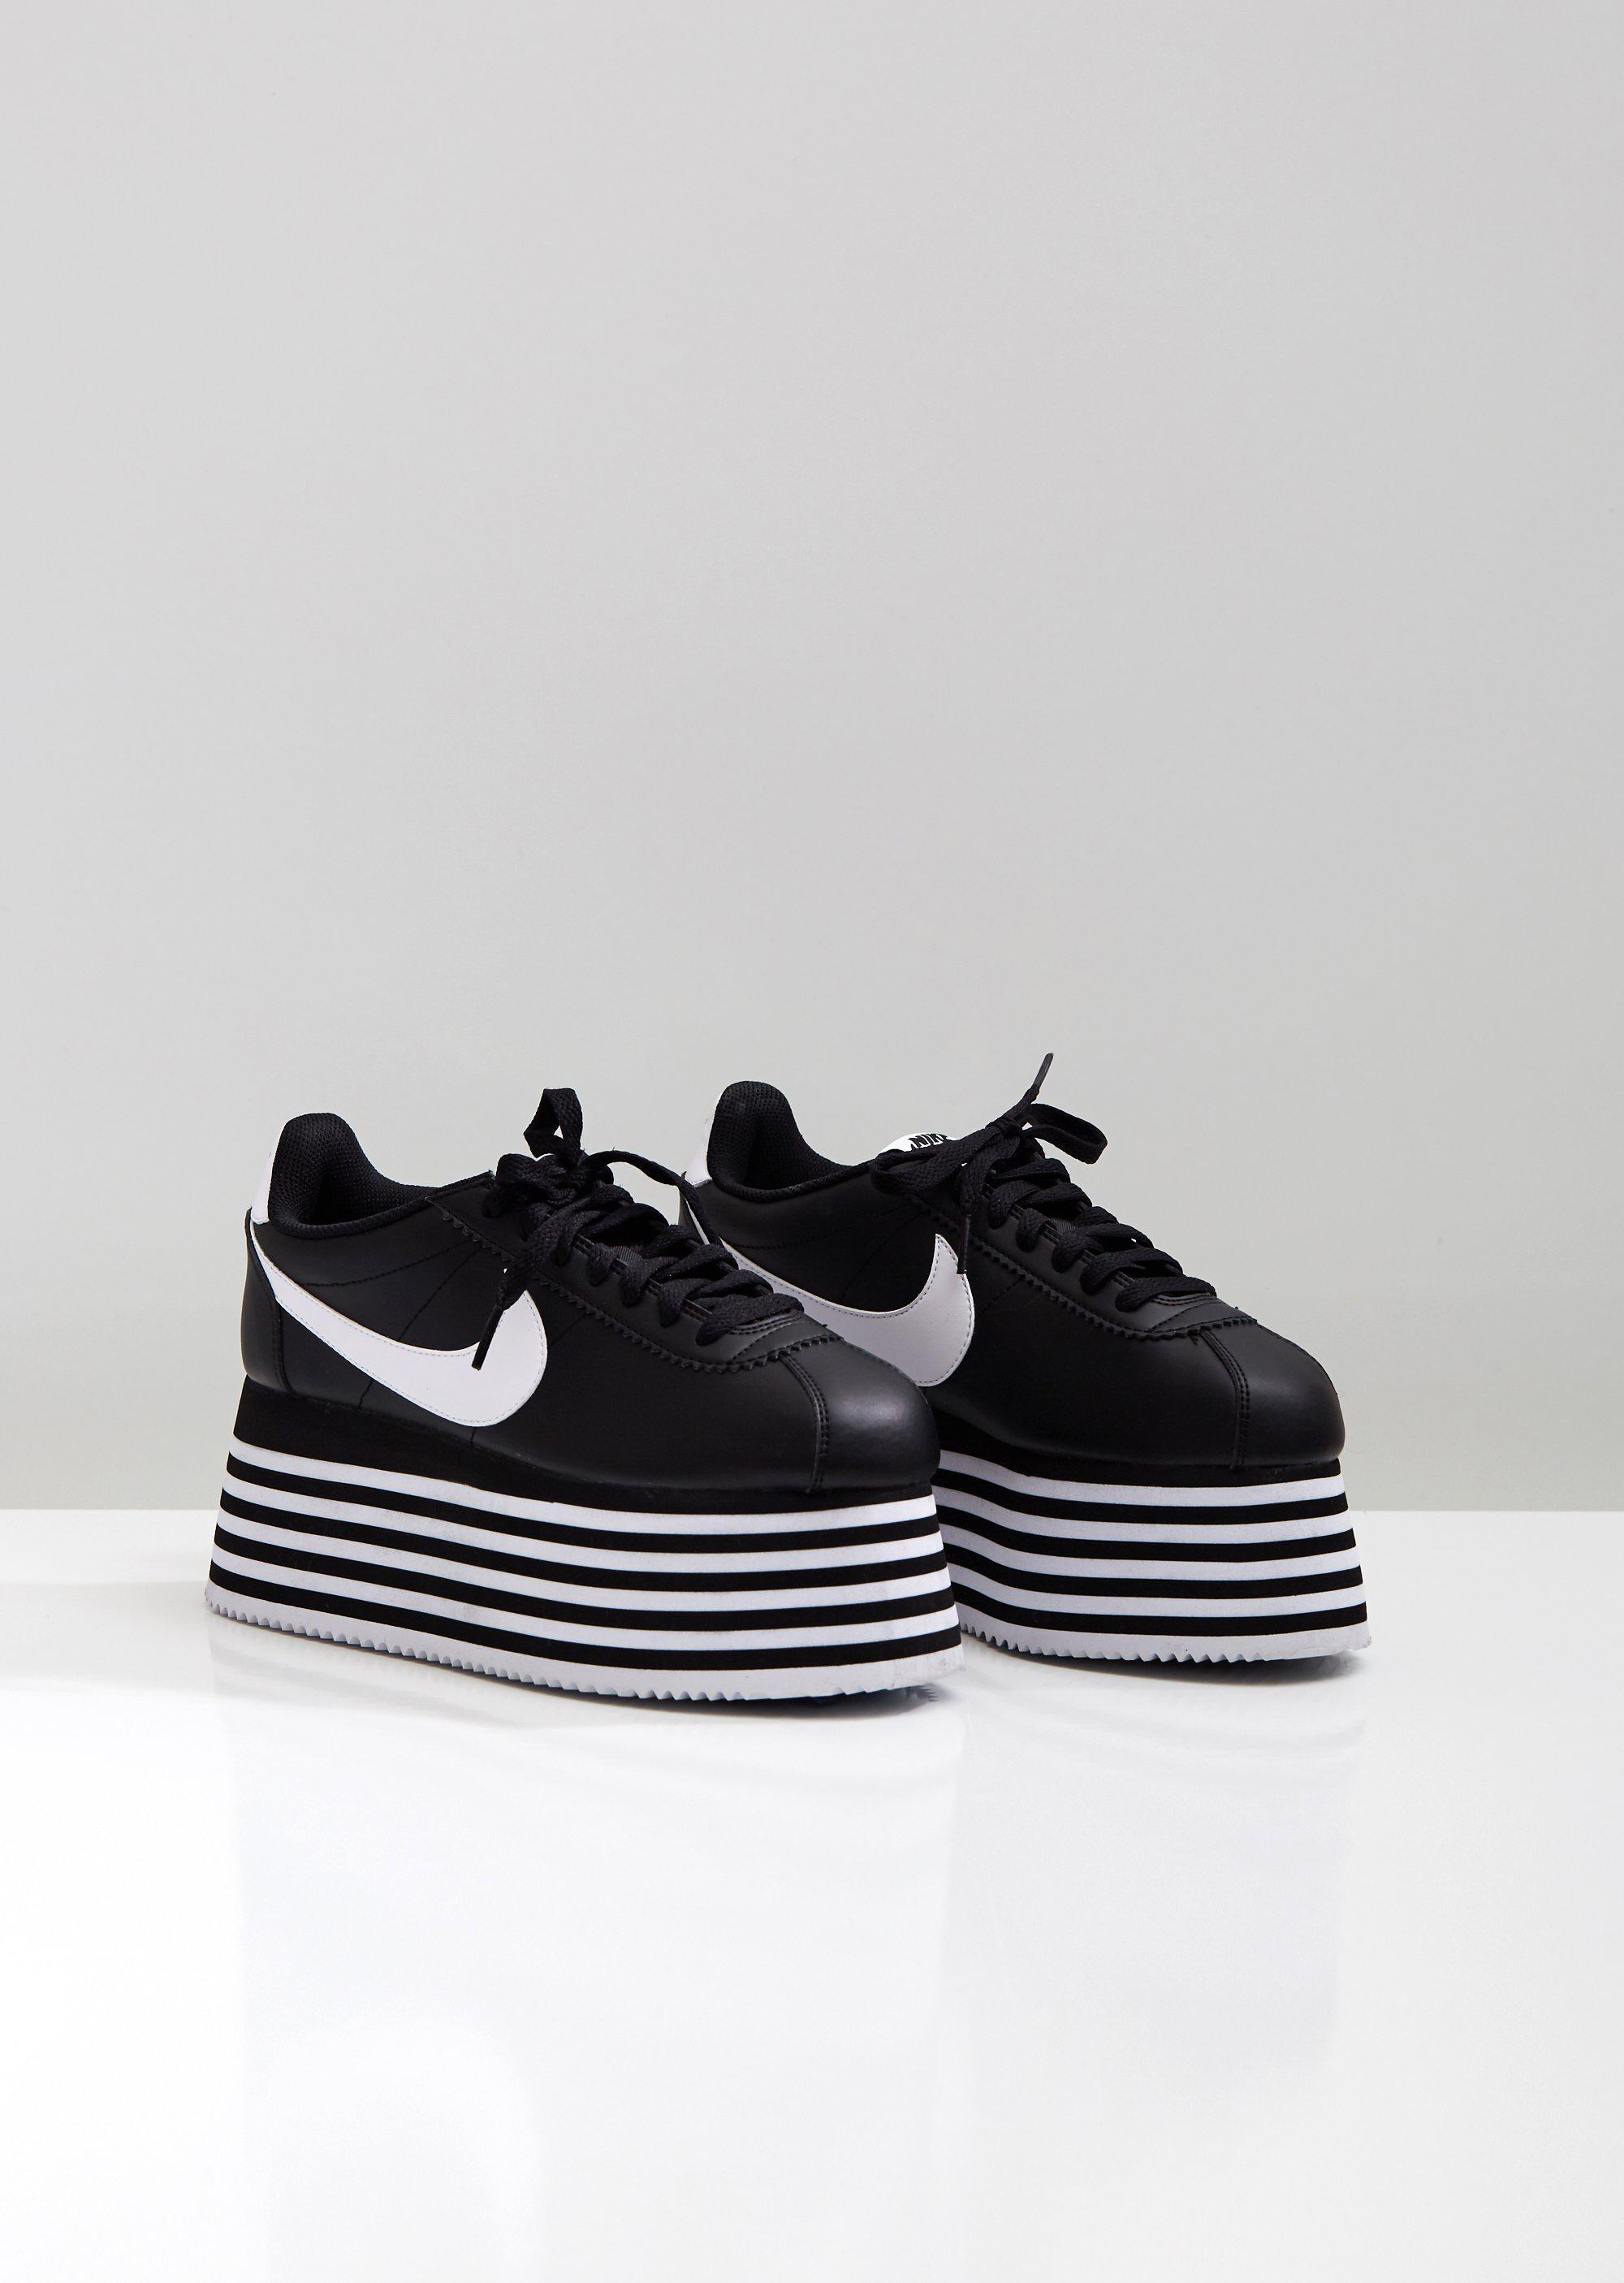 f41797c08f4c Comme des Garçons - Black Nike Striped Platform Cortez Sneakers - Lyst.  View fullscreen